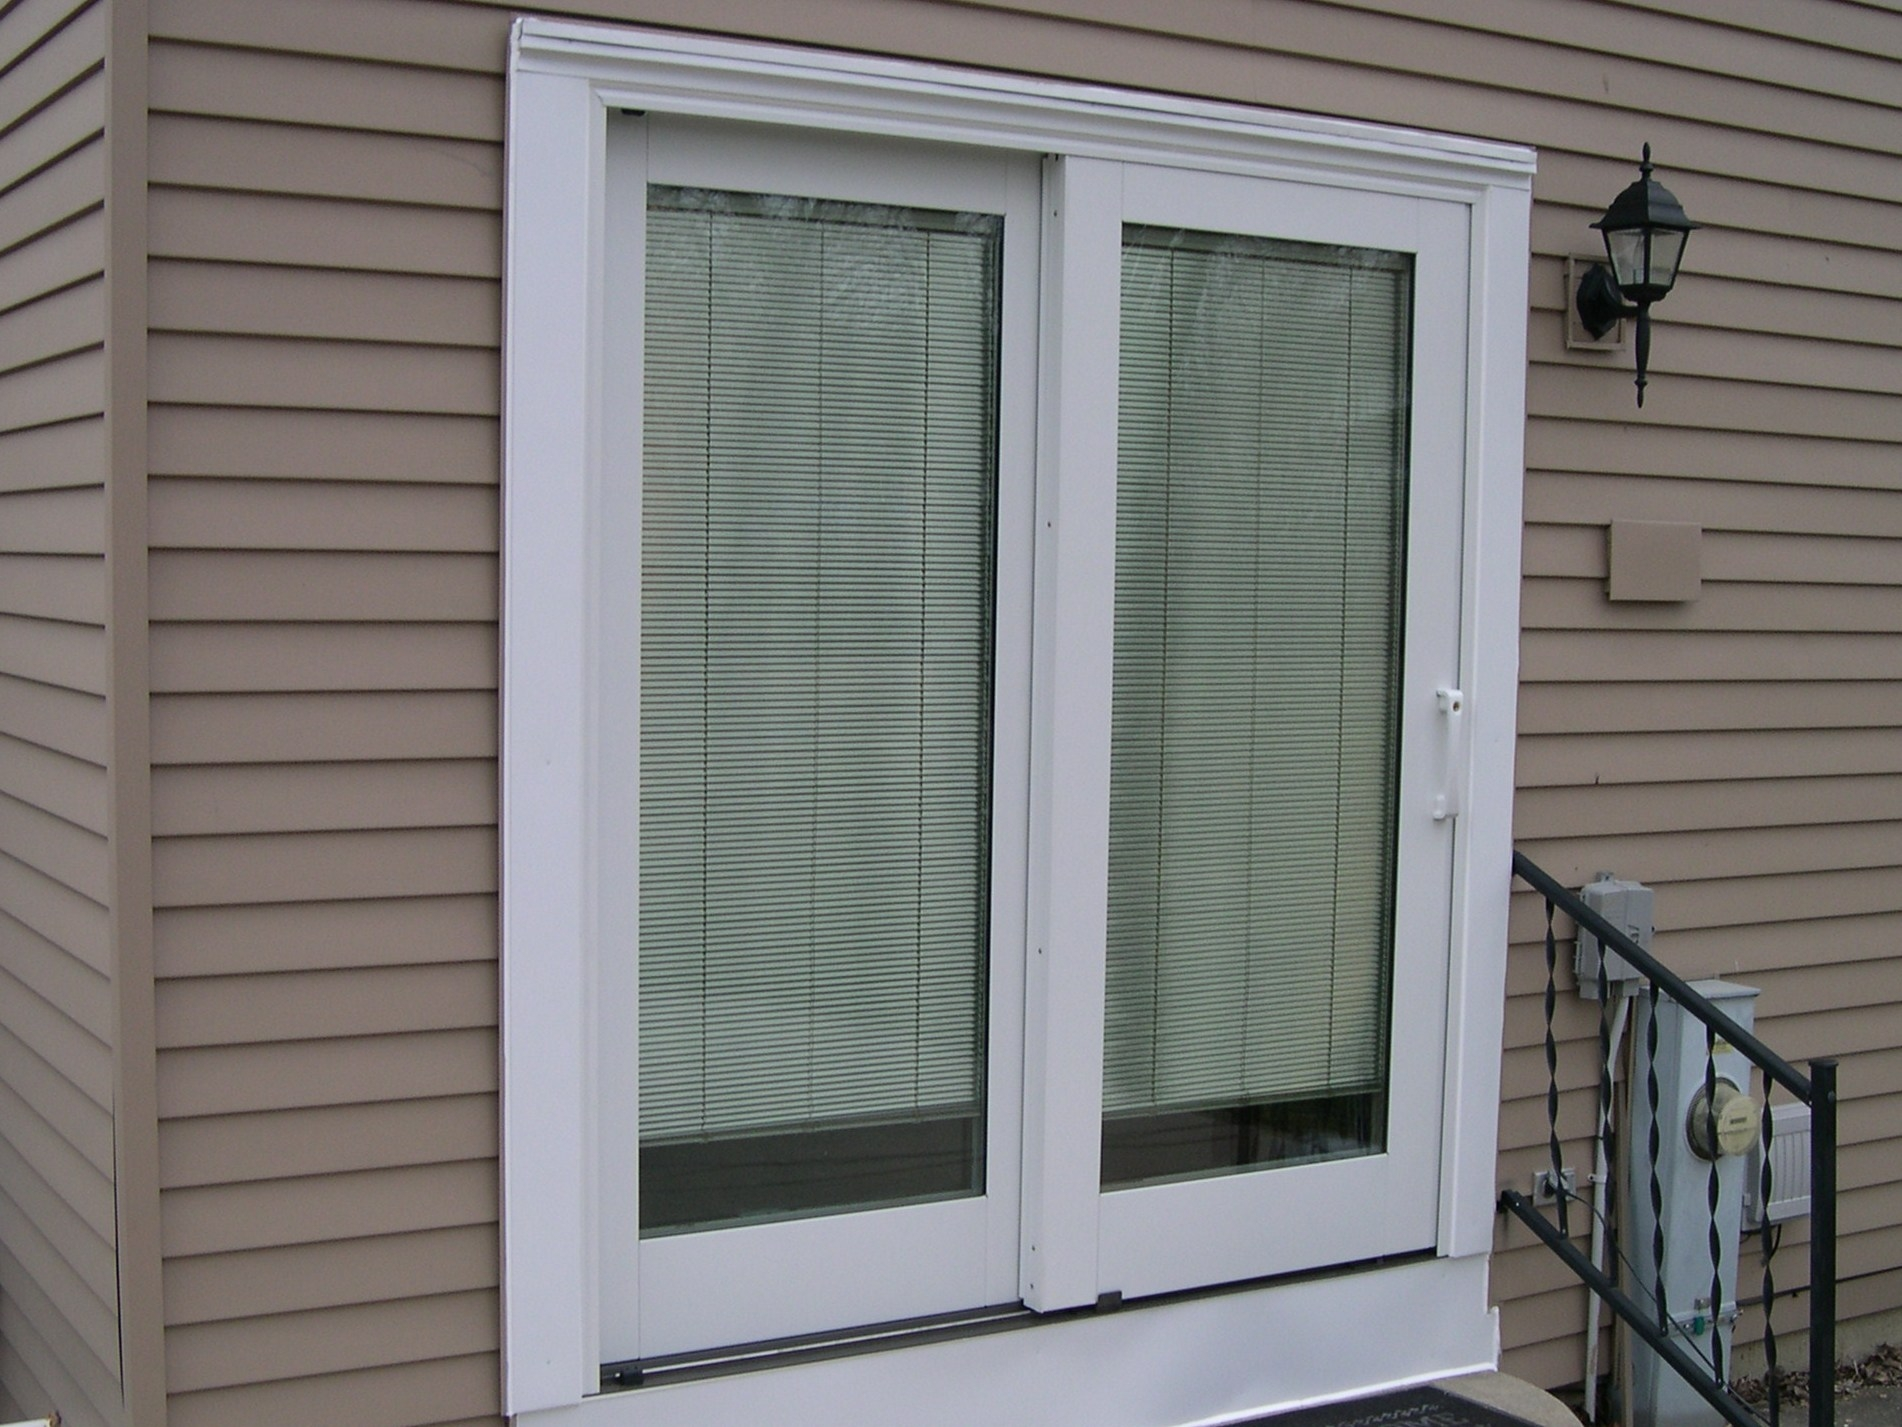 Pella Sliding Doors With Interior Blindscharming pella sliding glass doors with blinds inside at wooden